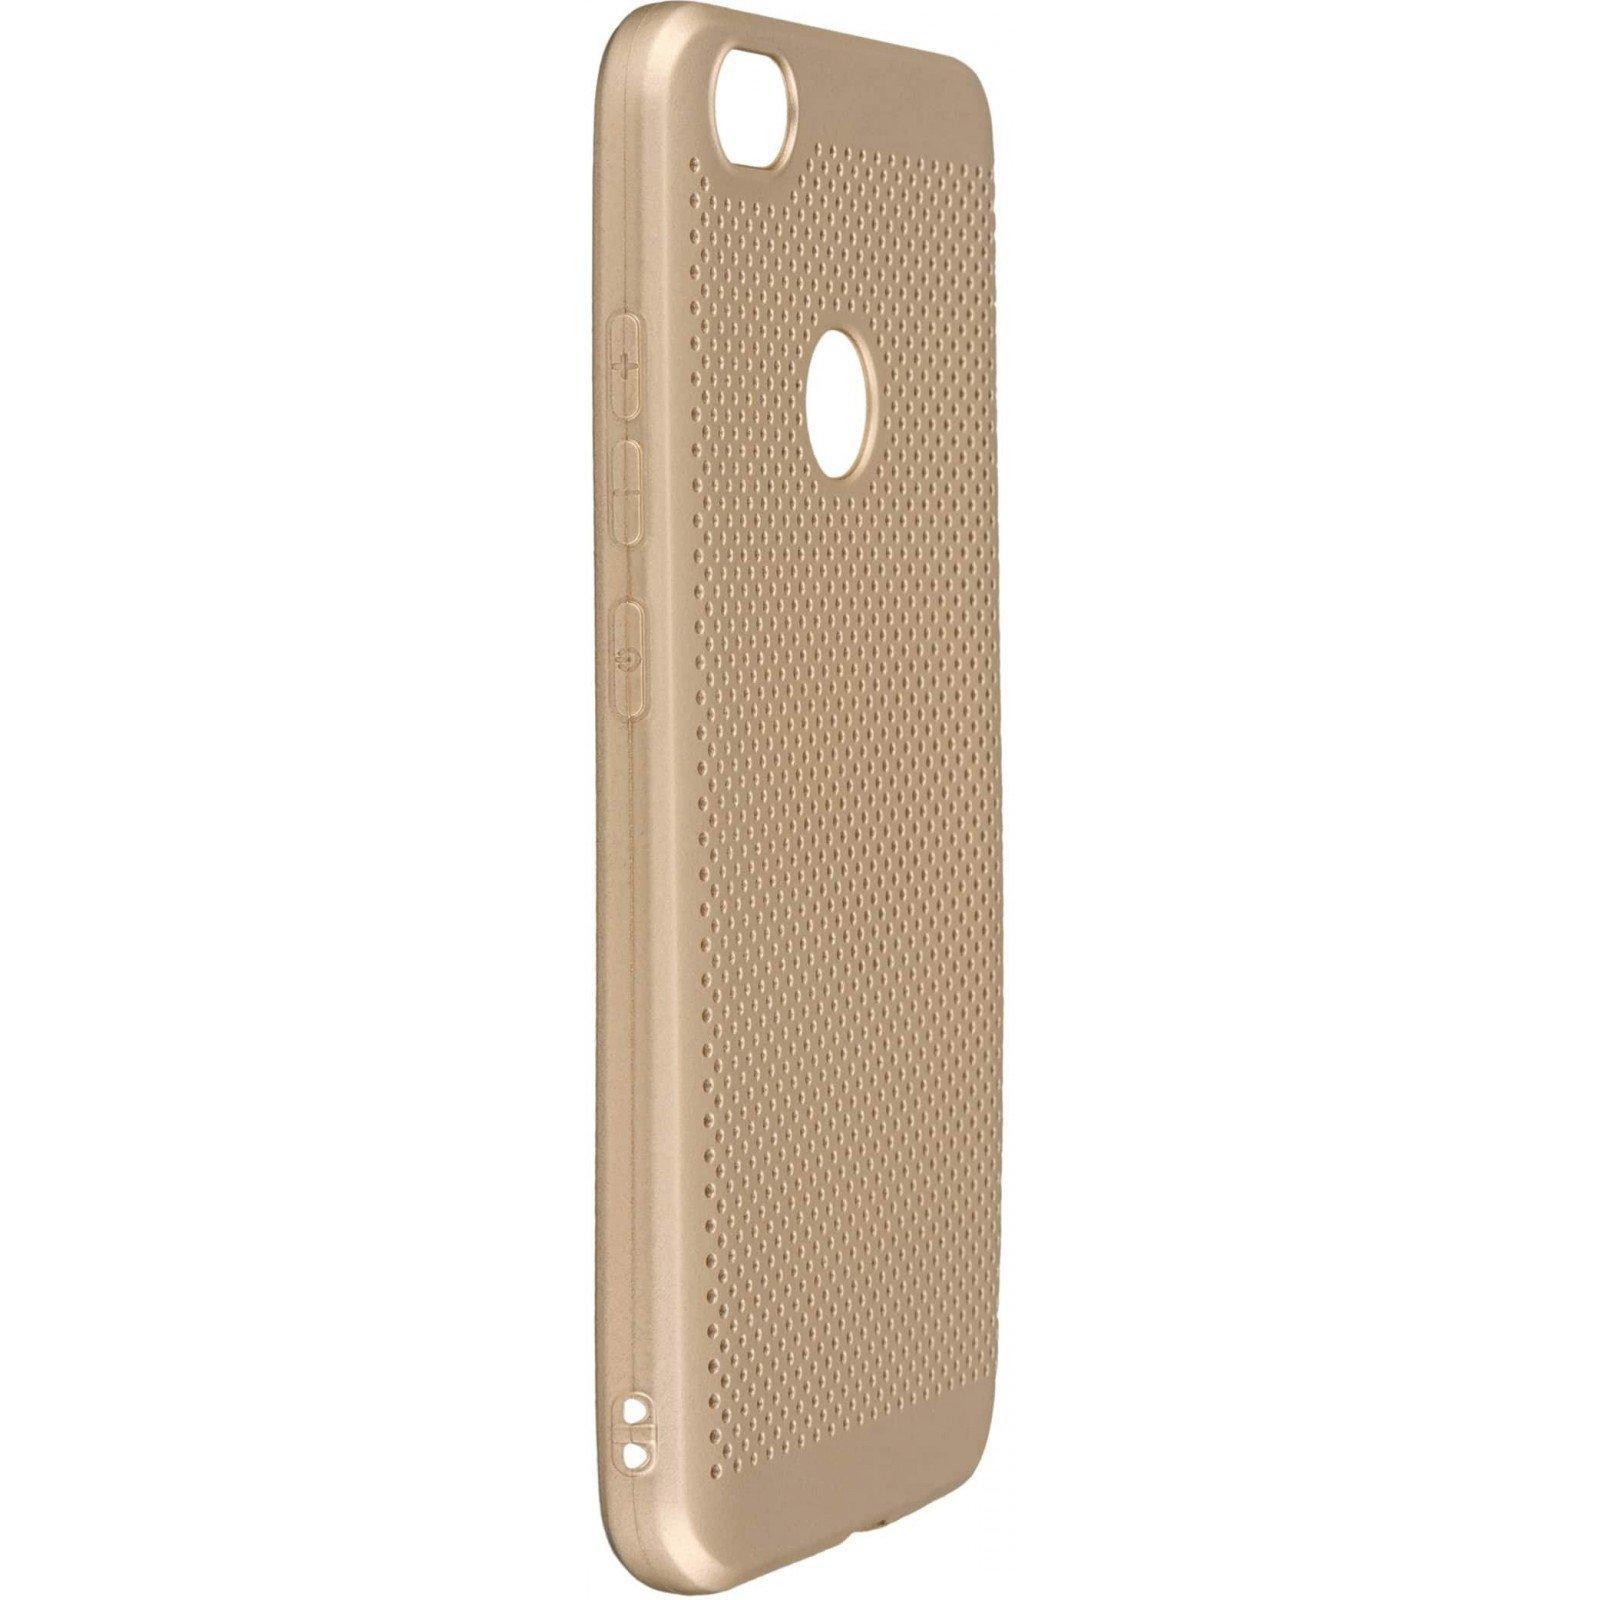 Чехол для моб. телефона MakeFuture TPU/Moon Case для Xiaomi Redmi Note 5A Prime Gold (MCM-XRN5APGD) изображение 5